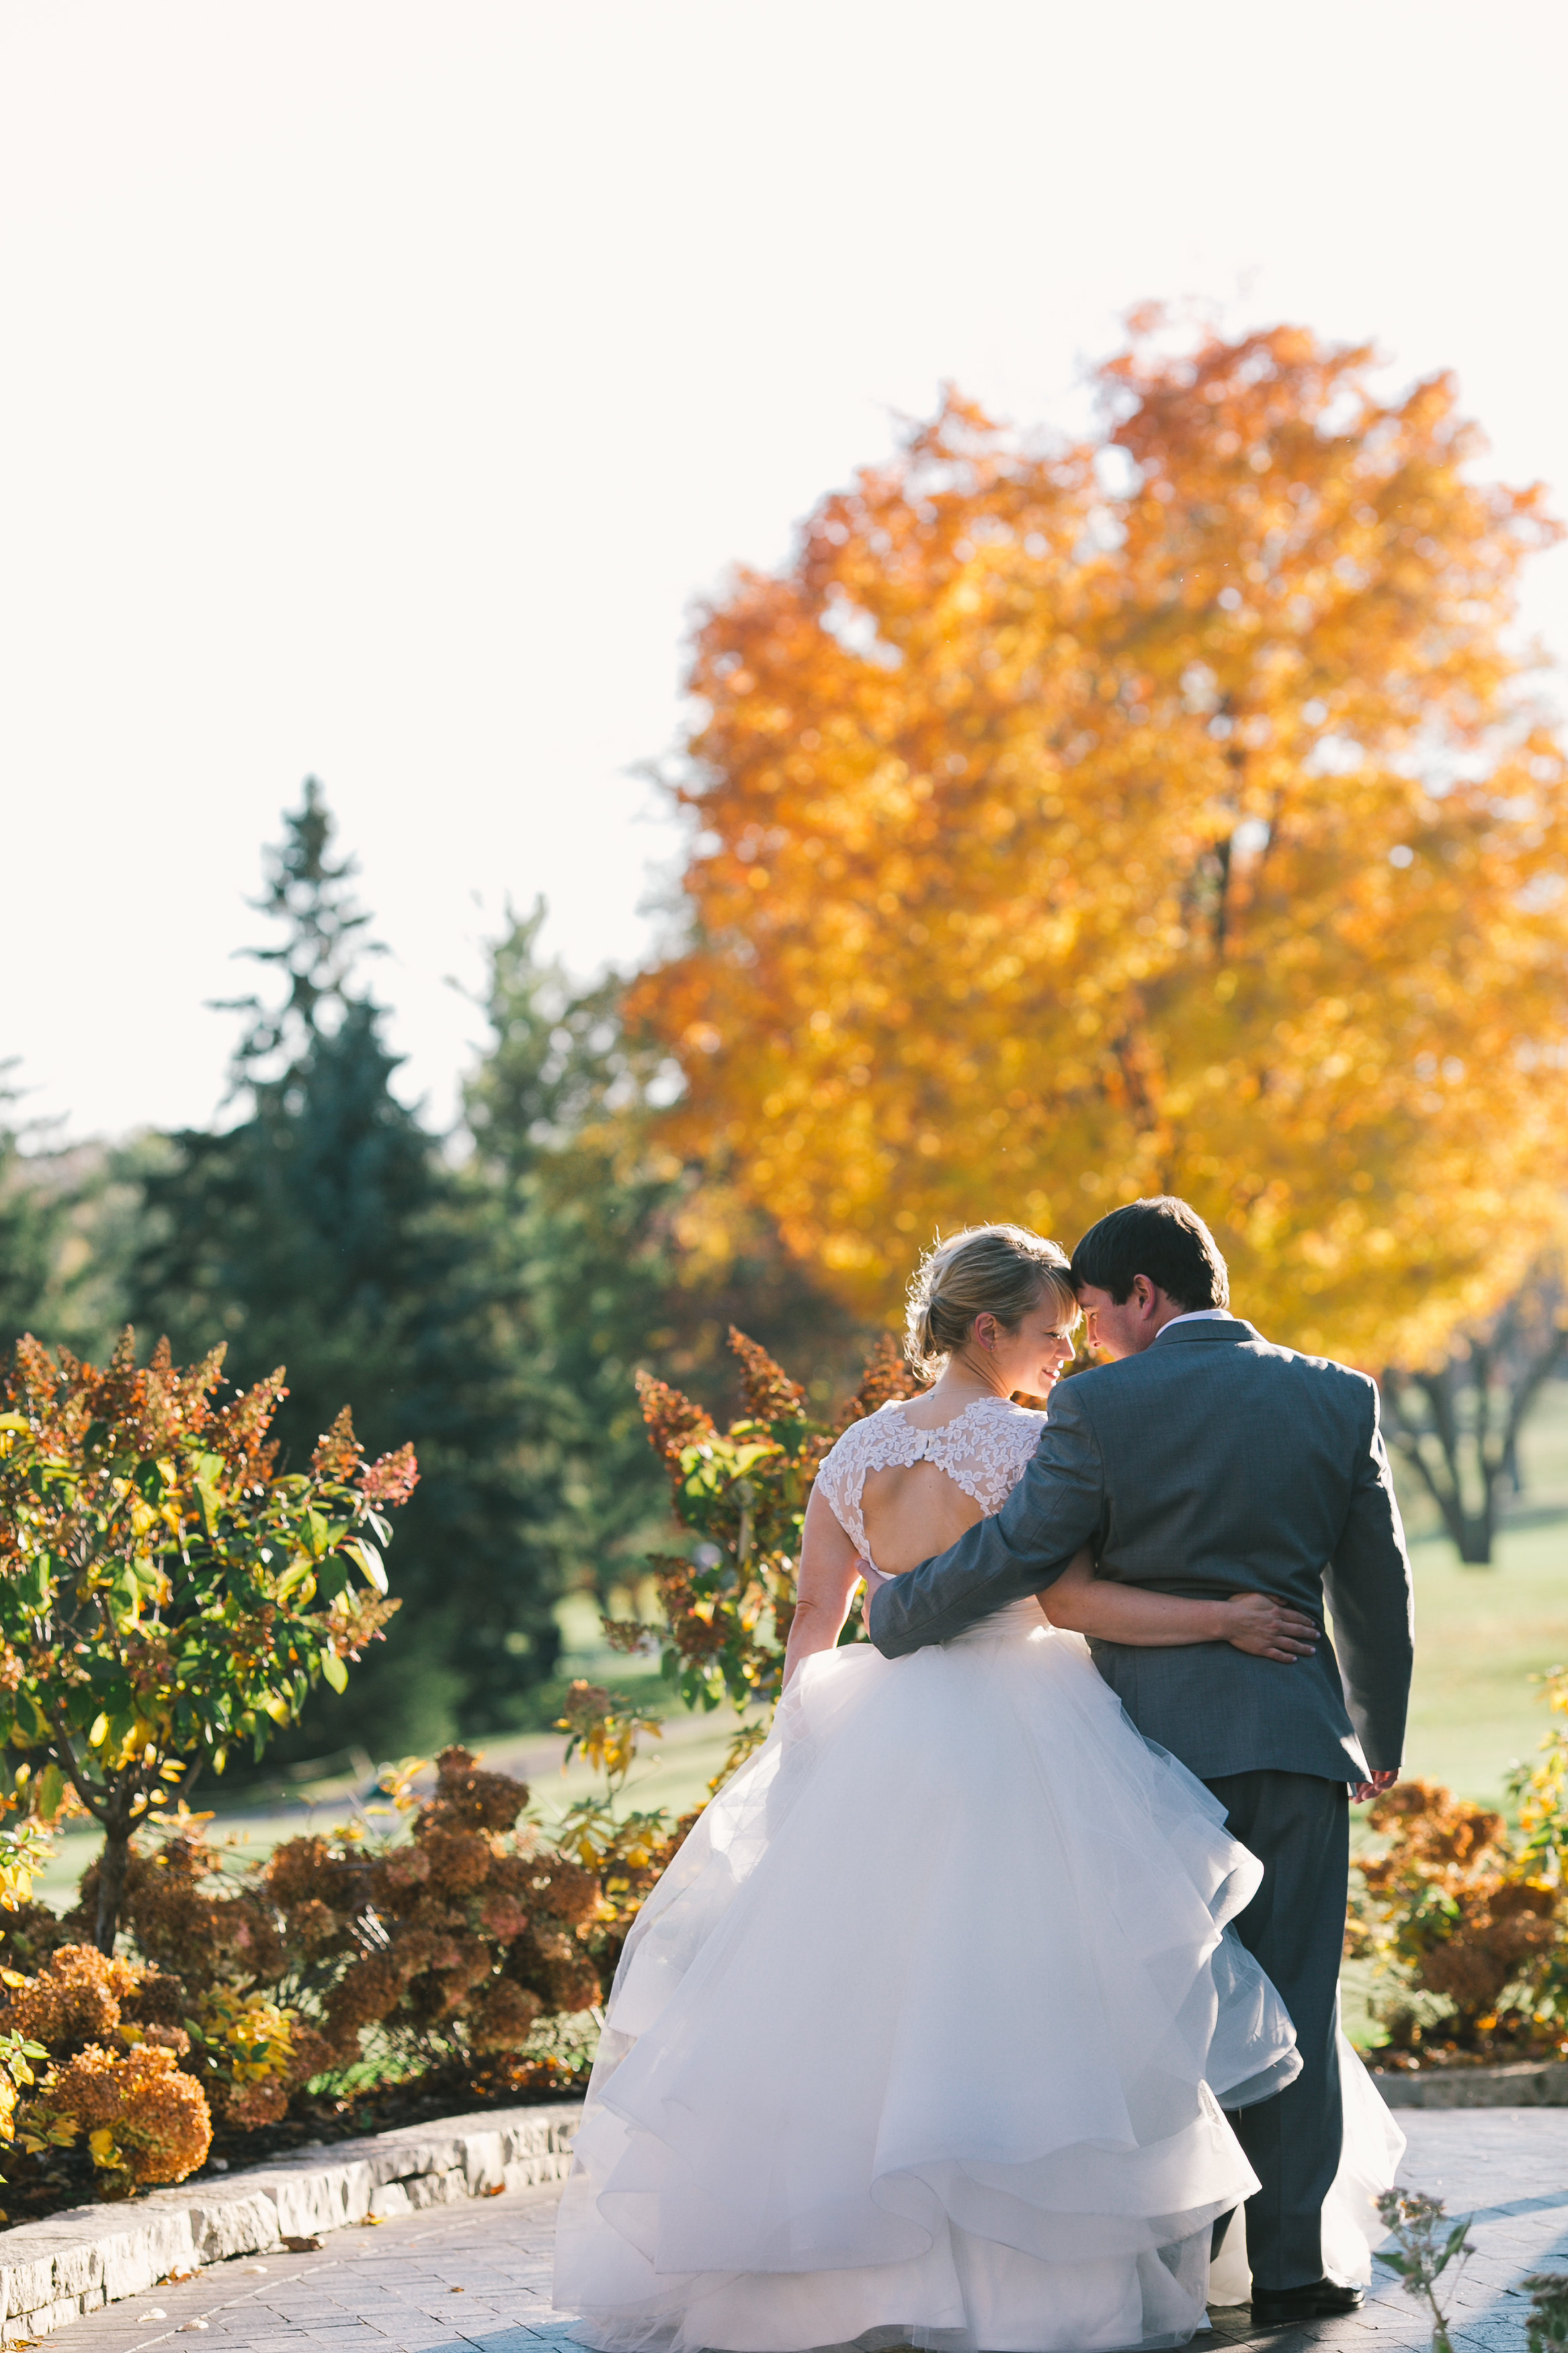 kim-nate-wedding-538 - Copy.jpg